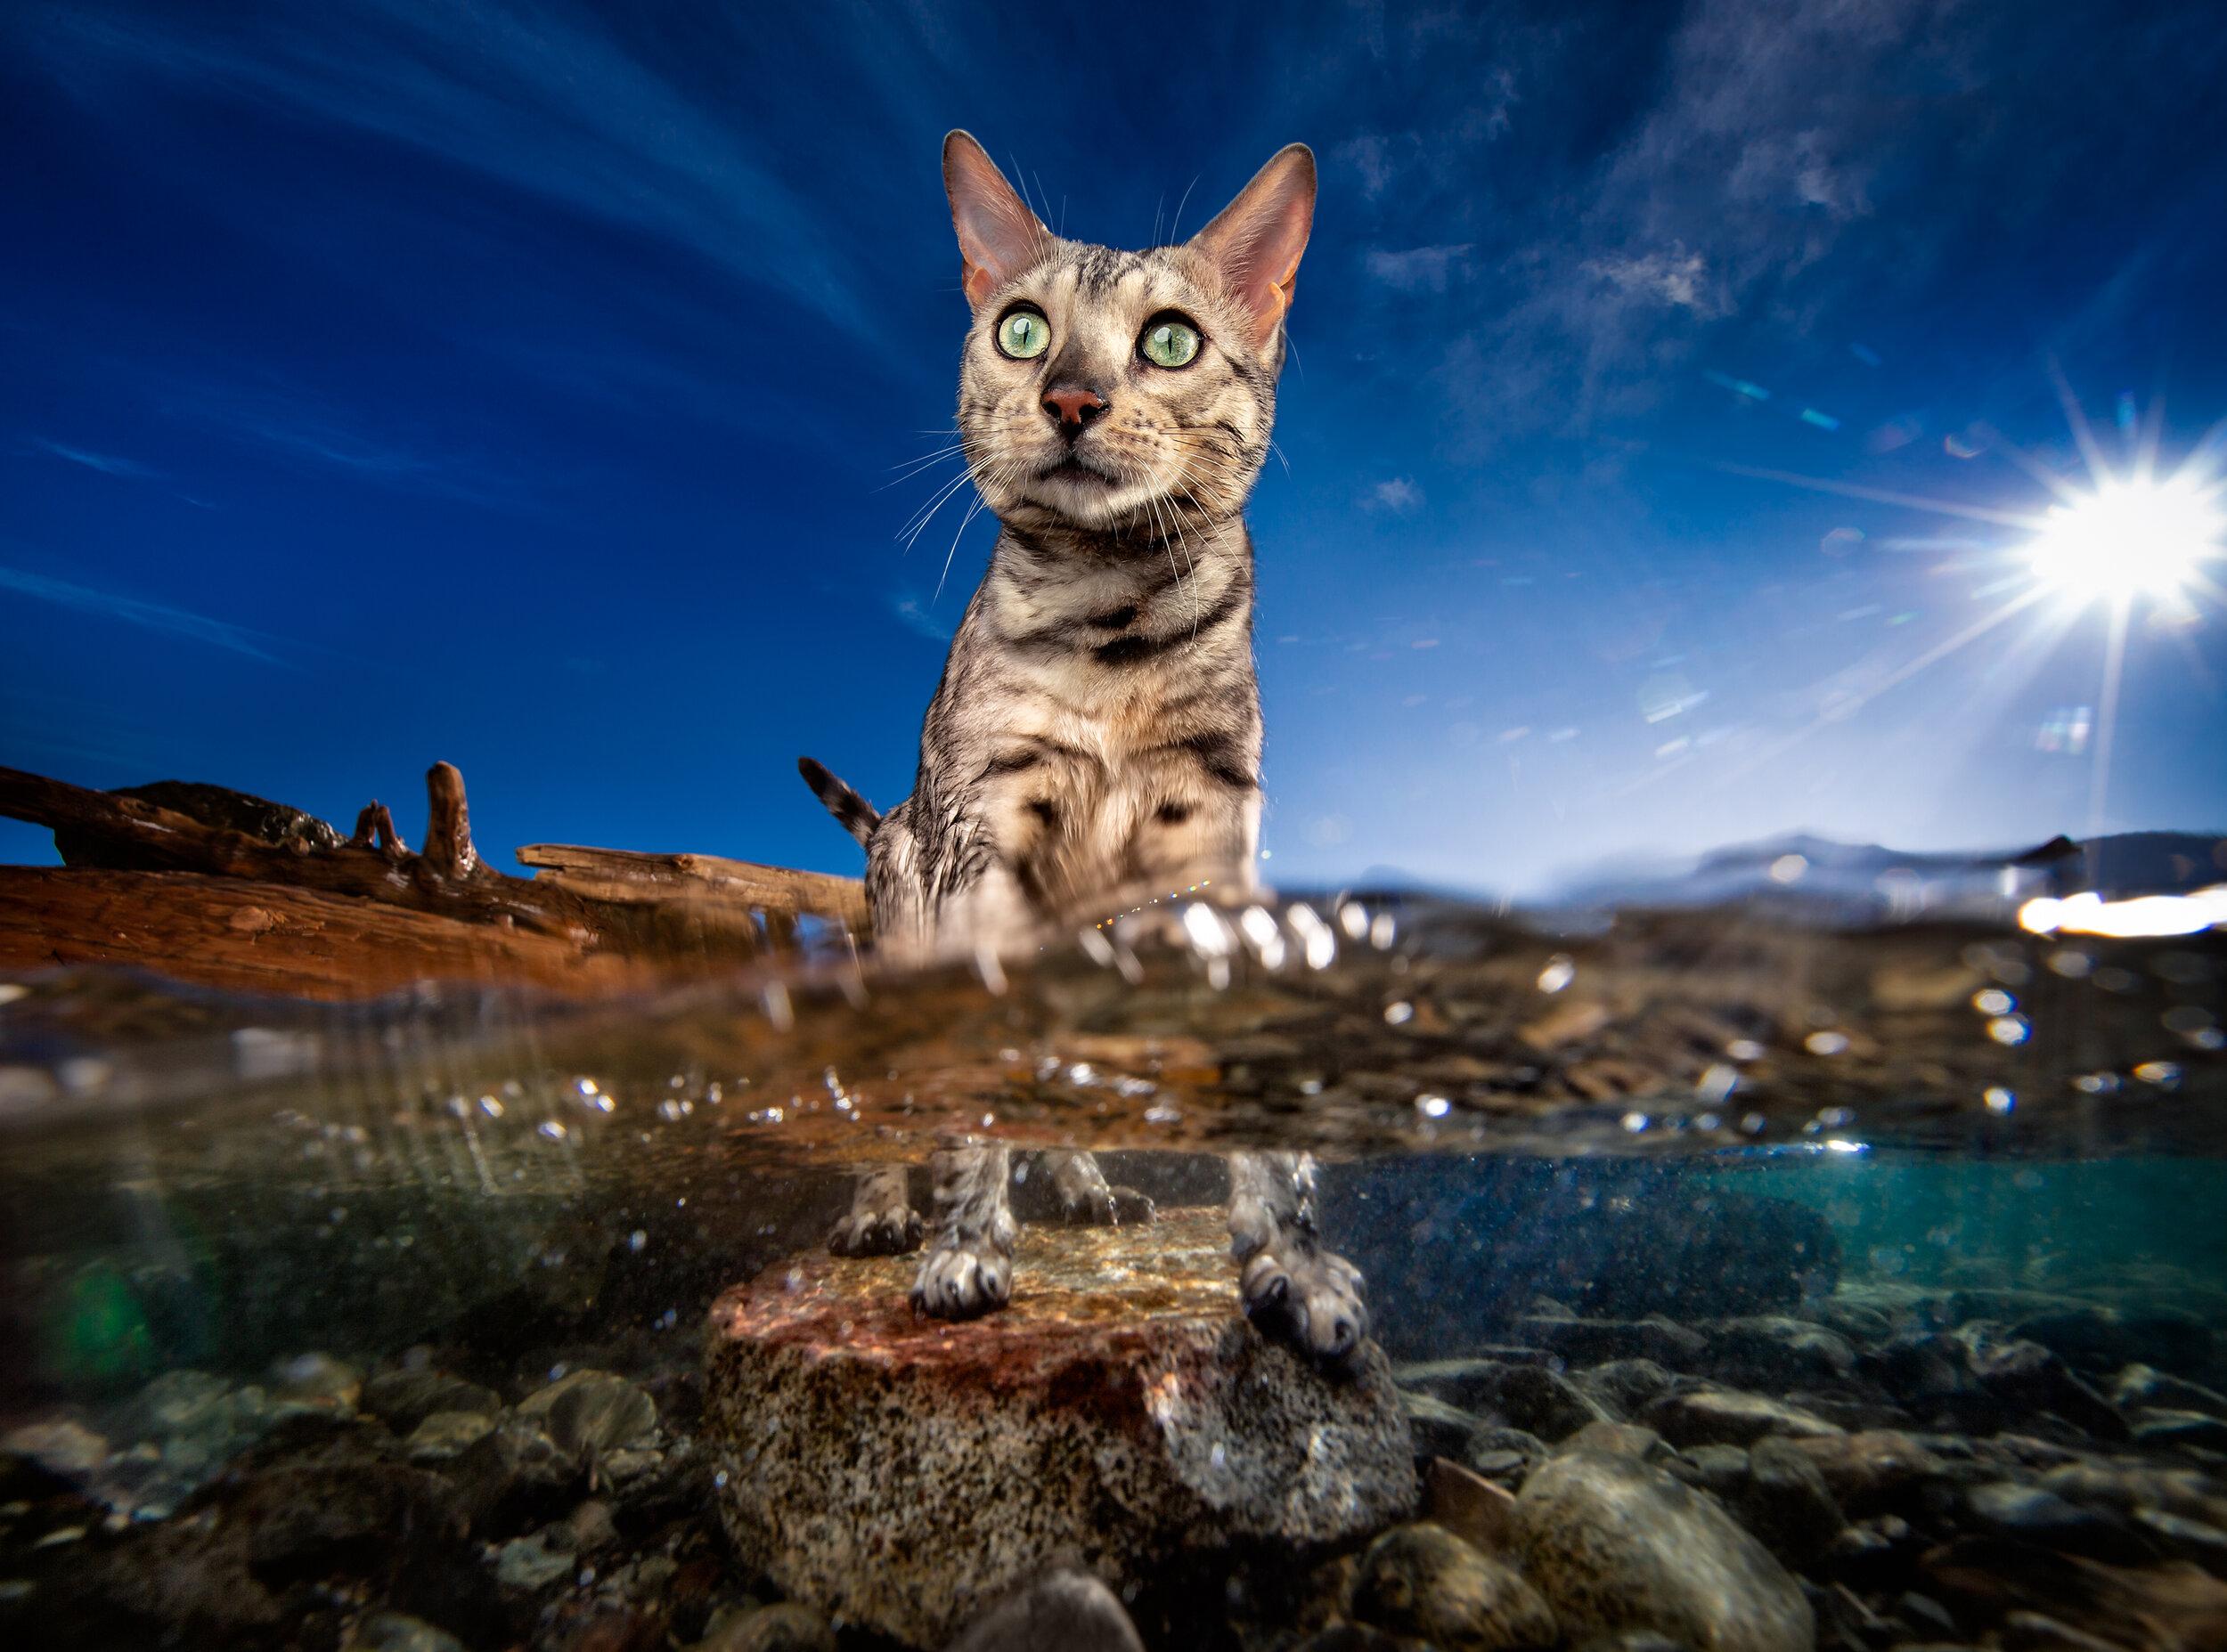 cat_underwater.jpg